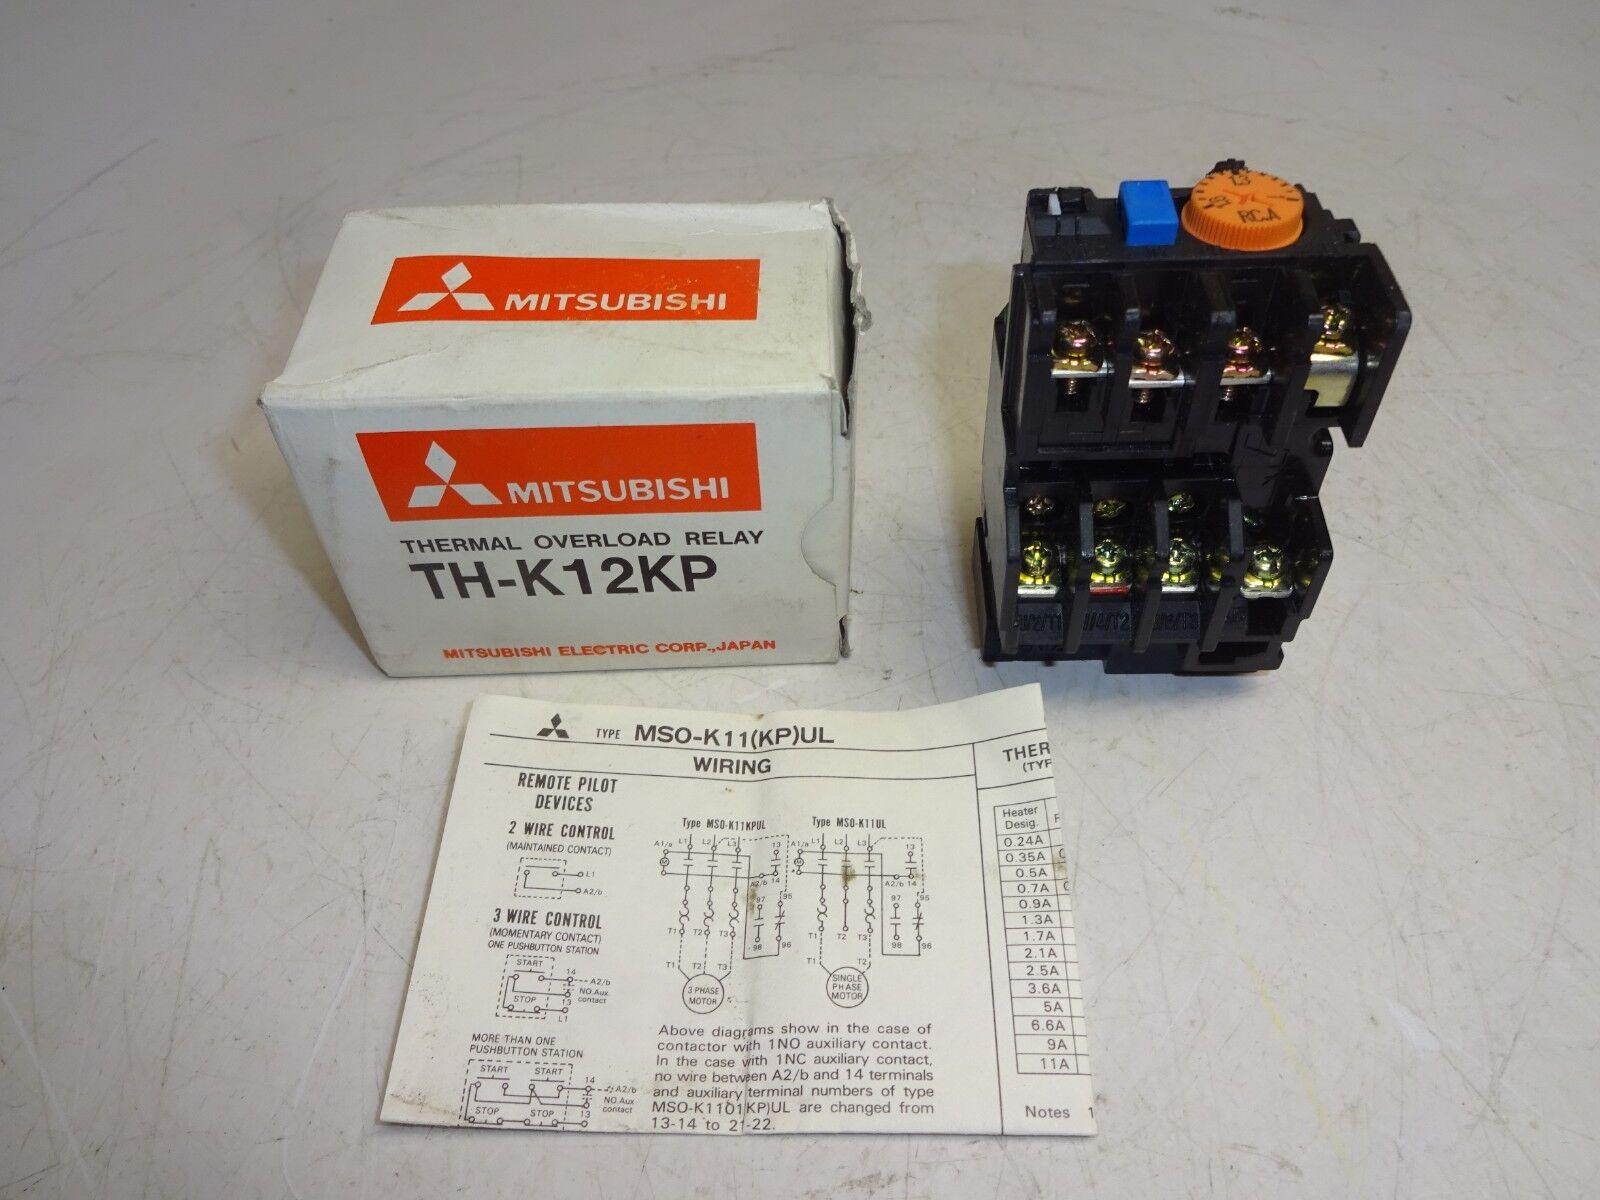 Mitsubishi Th K12kp Ul Thermal Overload Relay Ebay Electric 3 Phase Motor Wiring Diagram